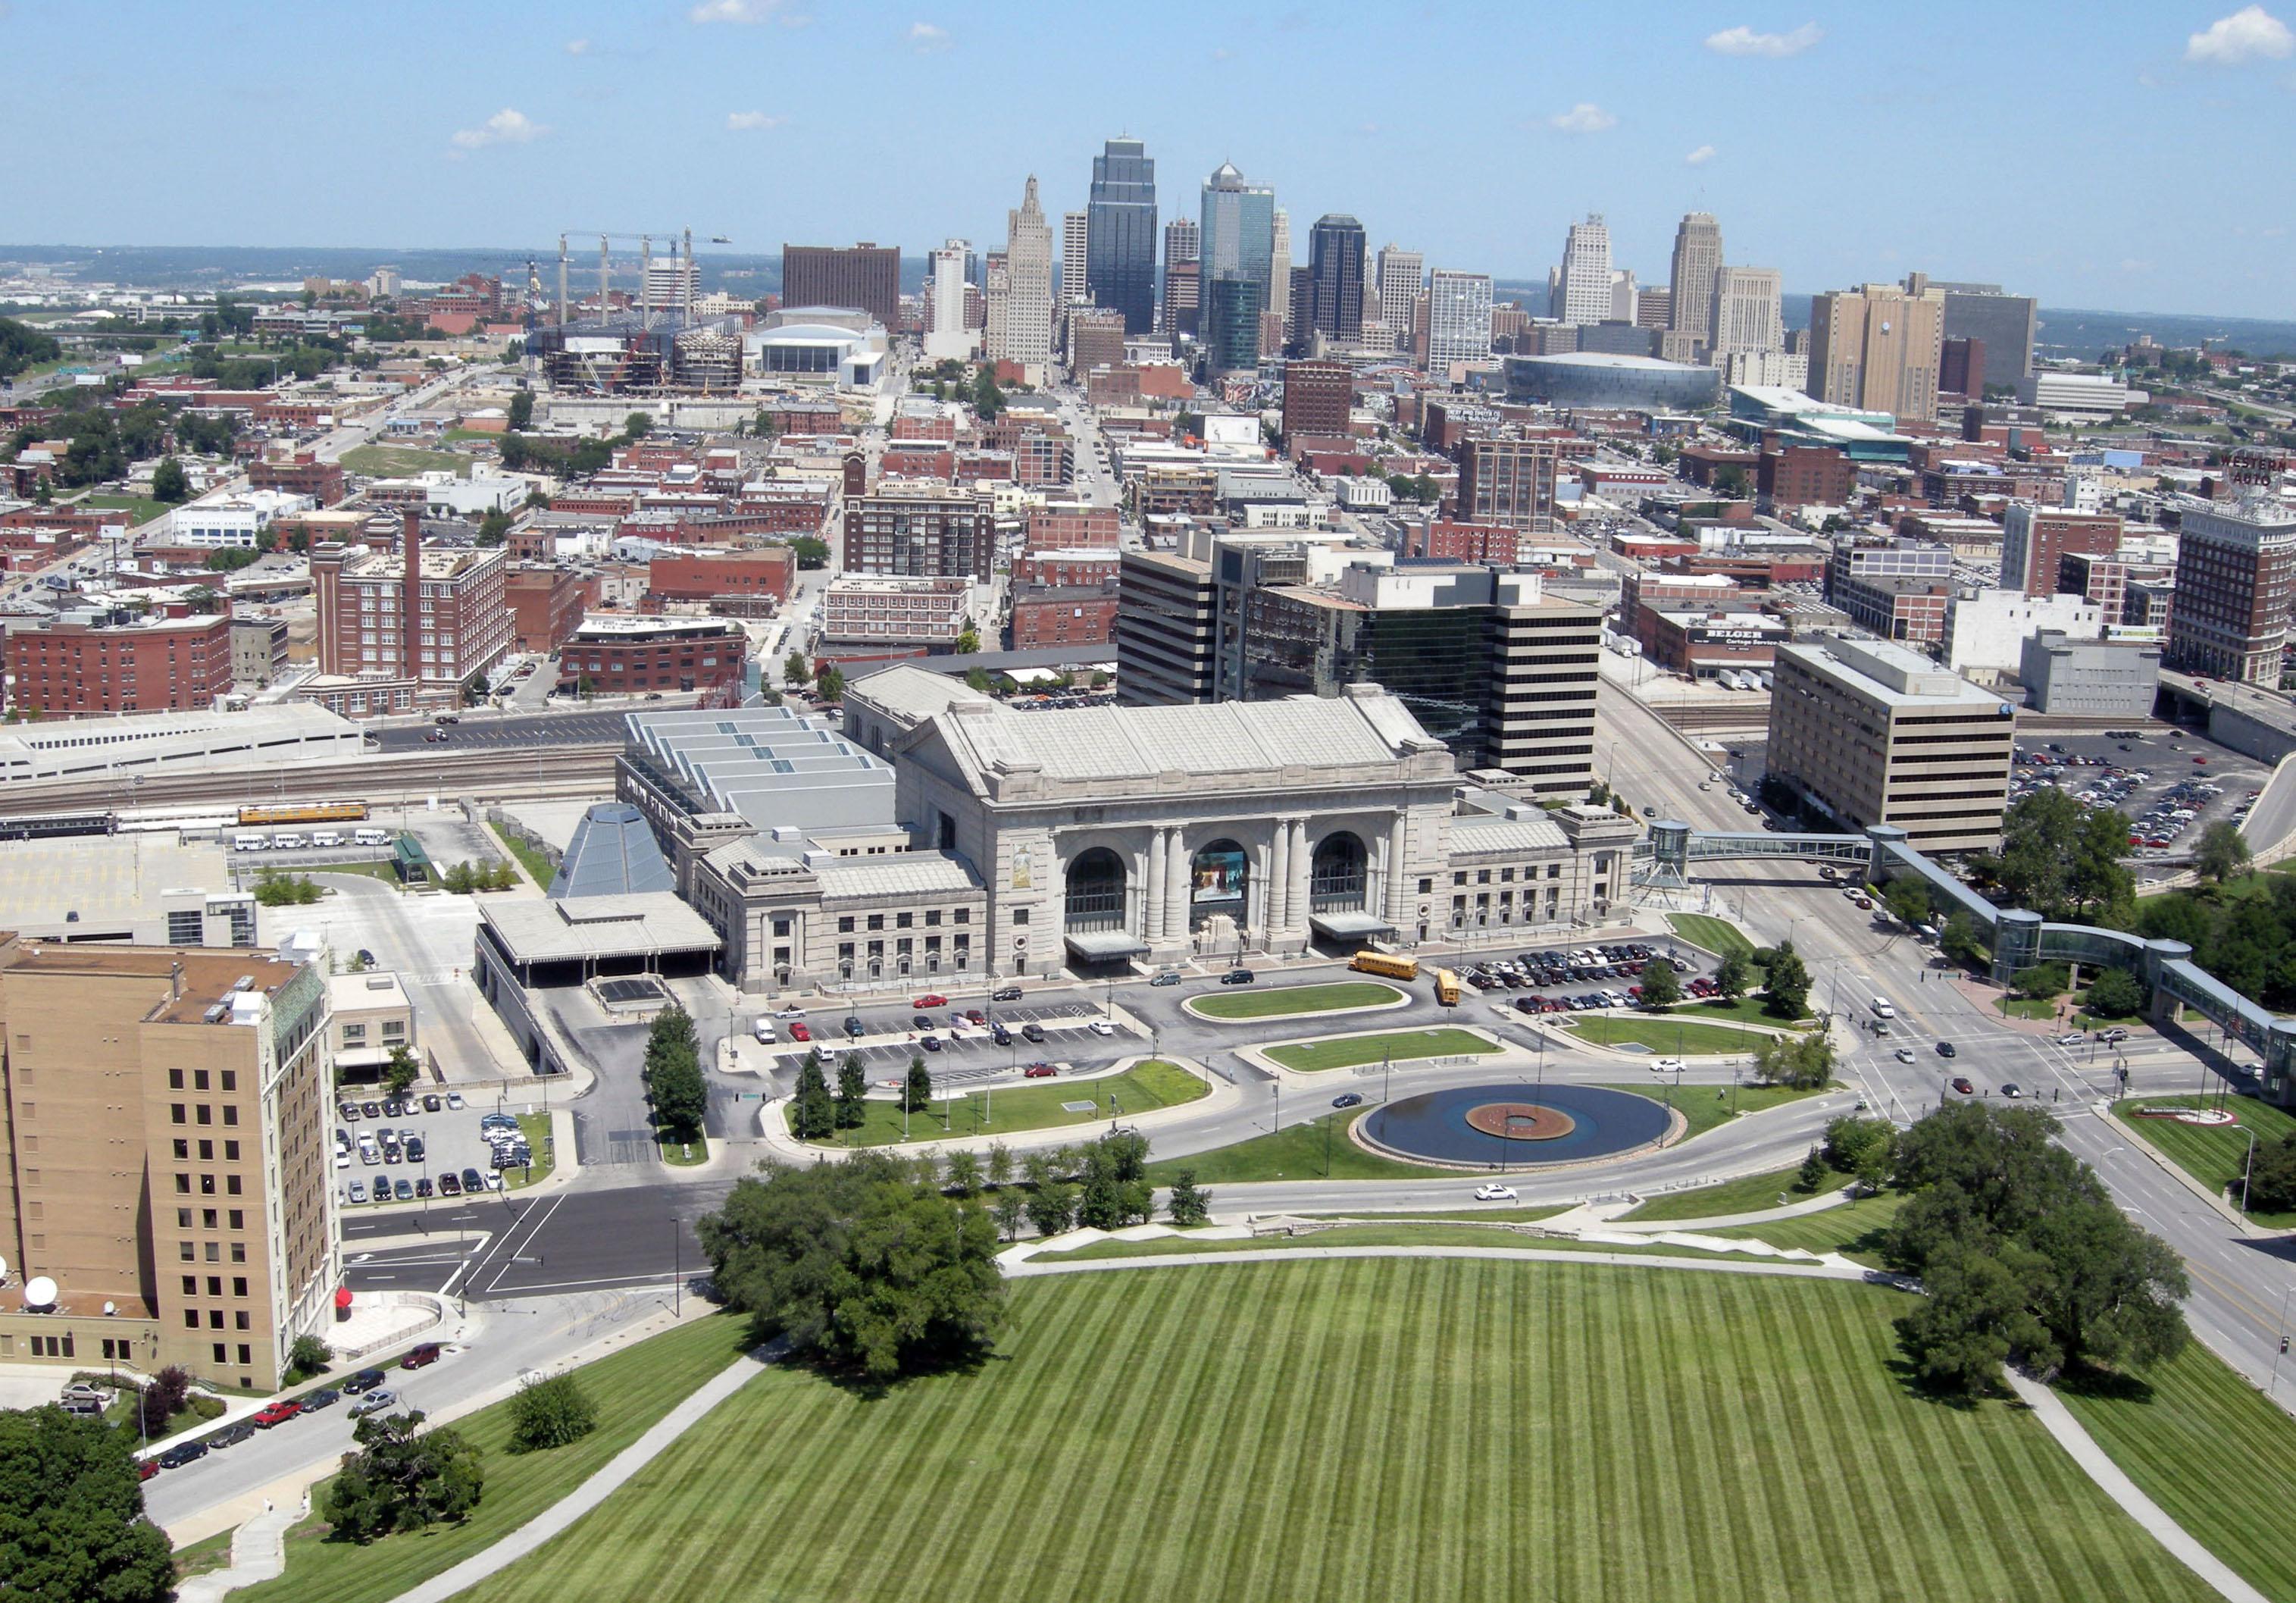 Downtown_Kansas_City,_Missouri_from_Liberty_Memorial